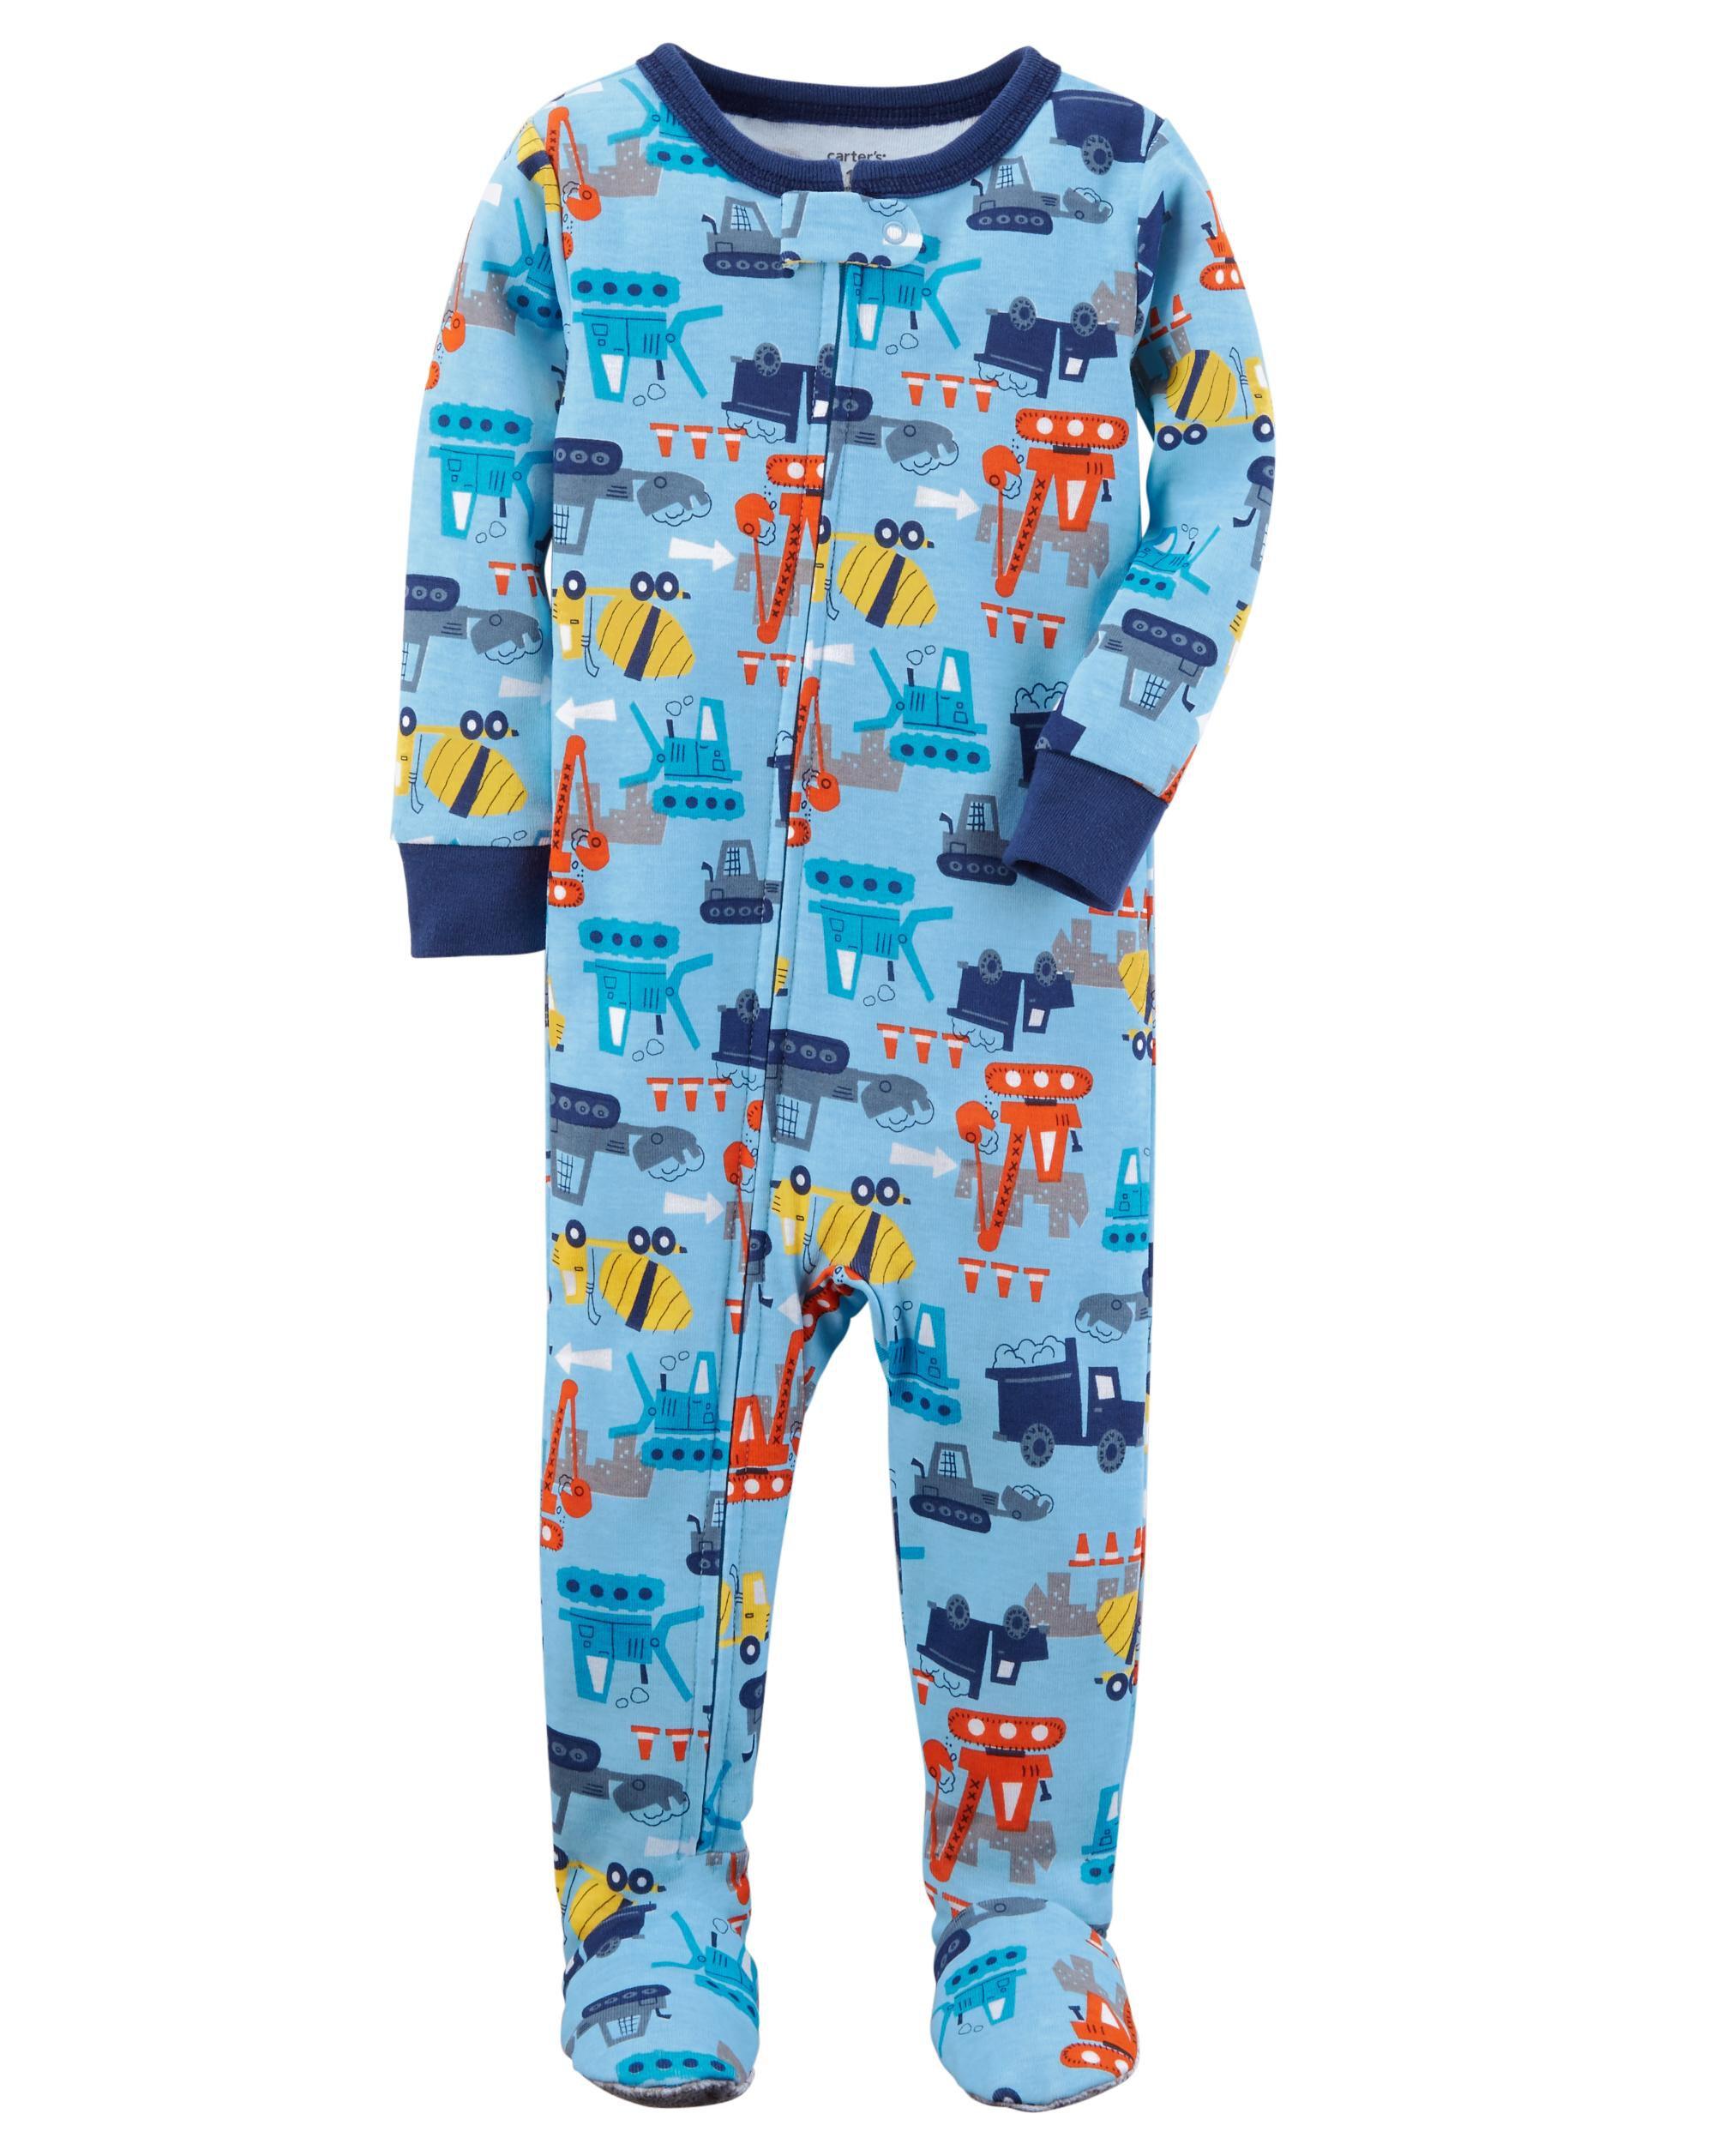 Carters 1-Piece Construction Snug Fit Cotton Sleep Romper